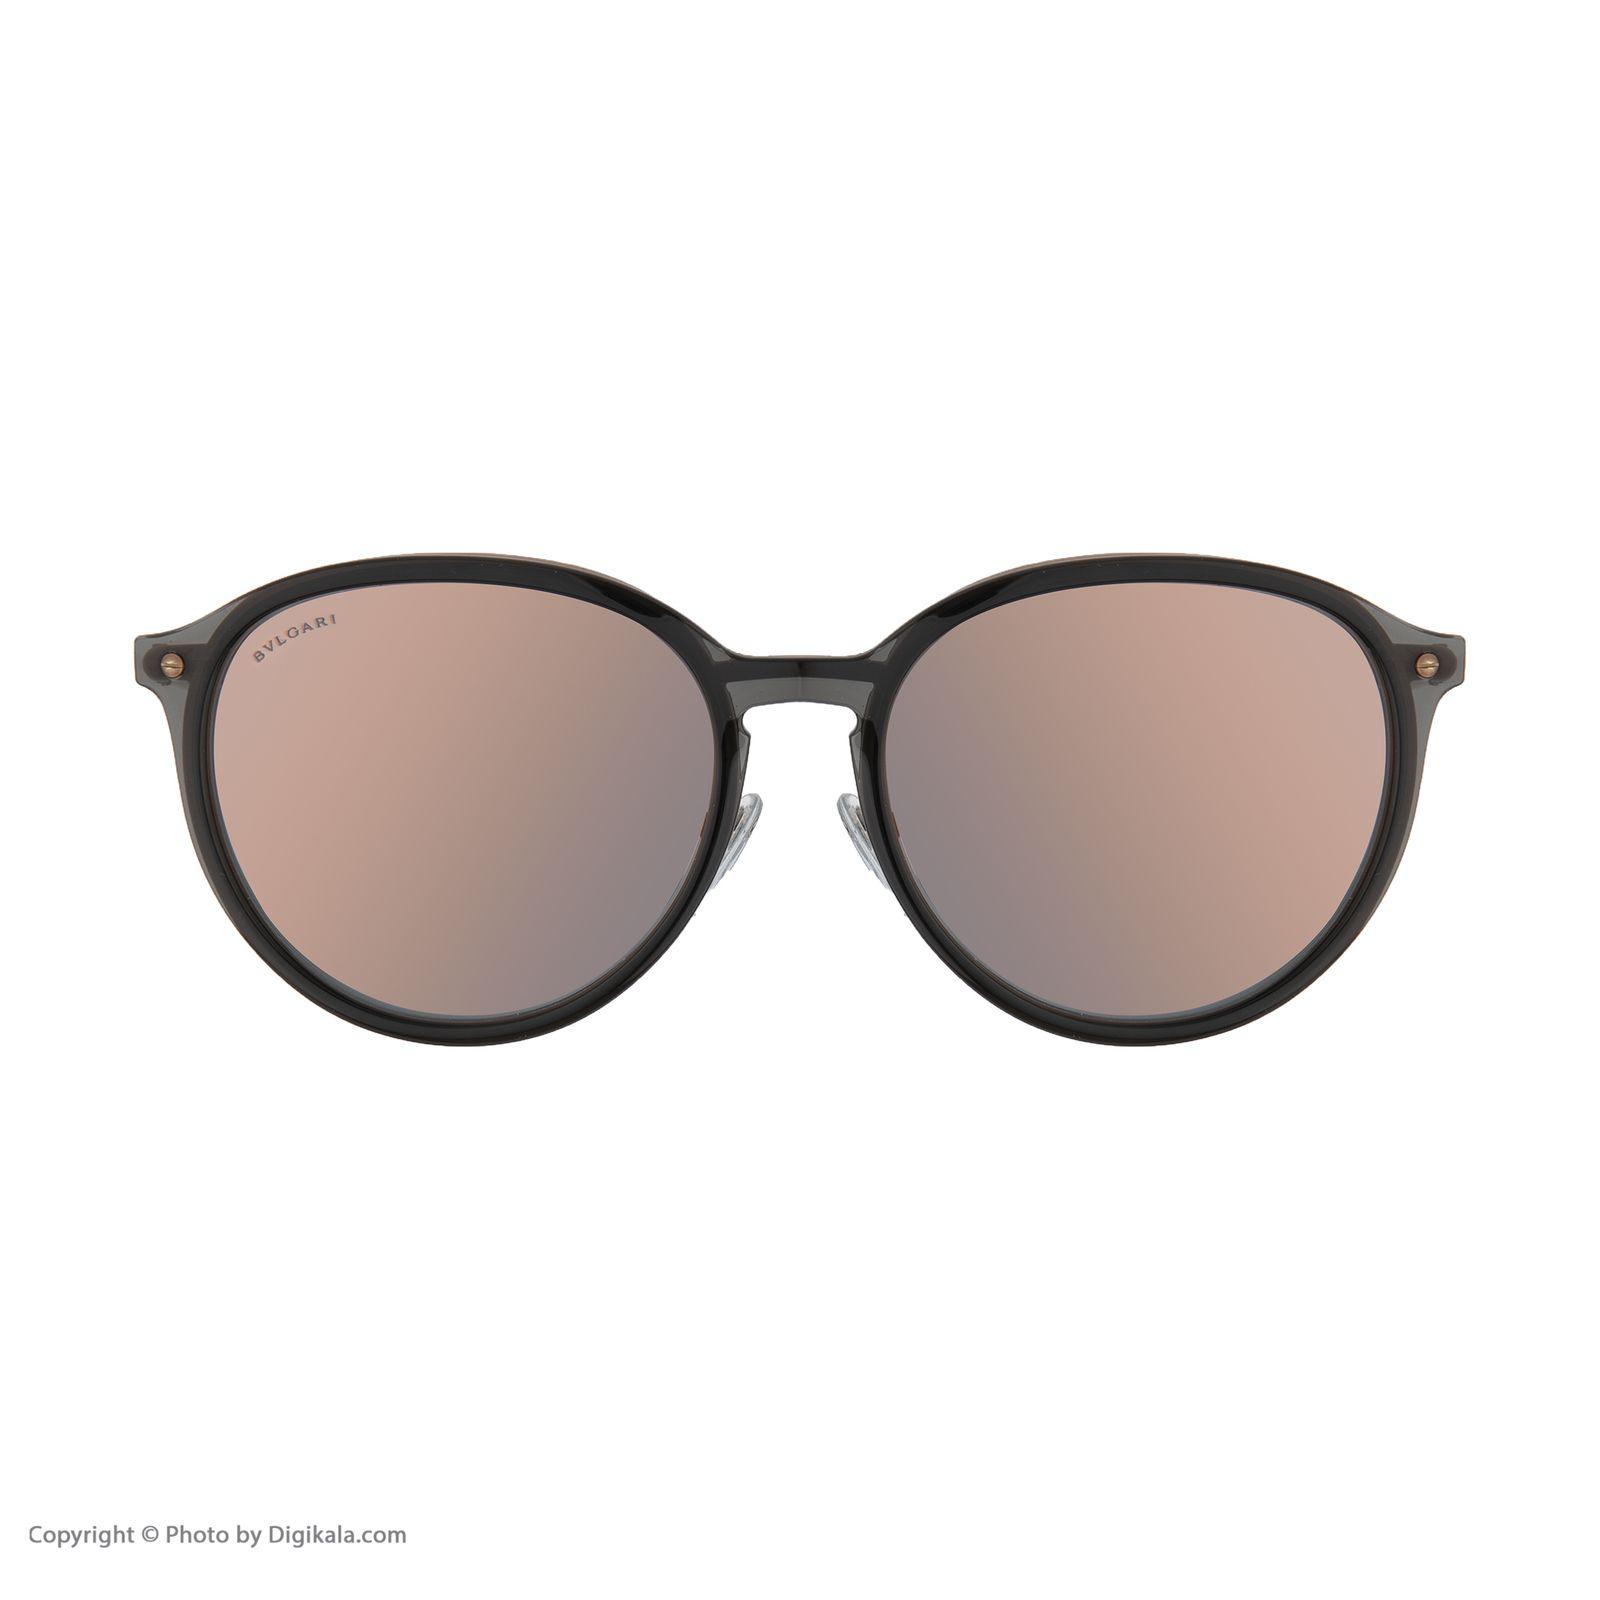 عینک آفتابی زنانه بولگاری مدل BV5045S 20134Z -  - 3